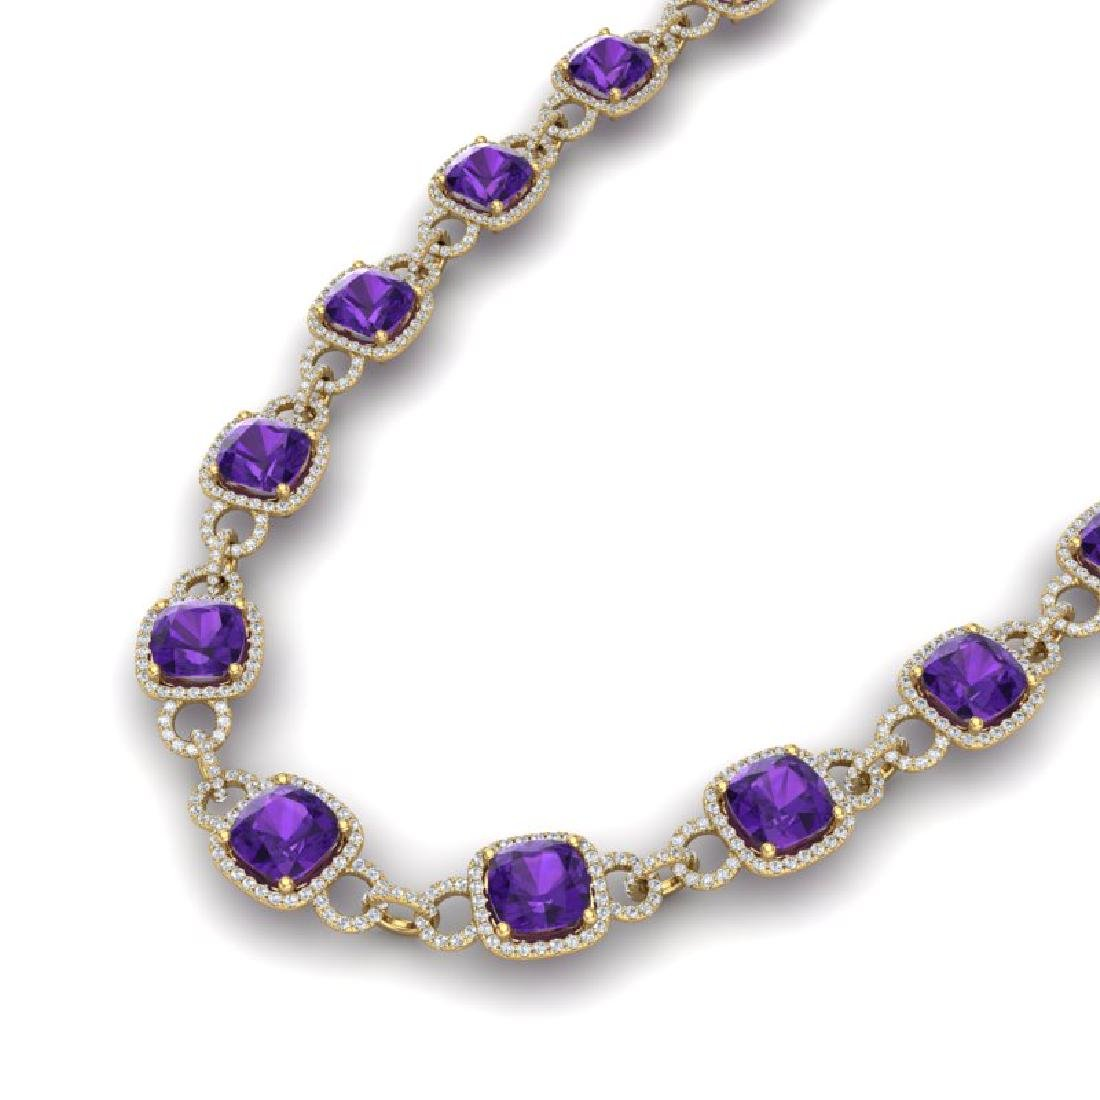 66 CTW Amethyst & VS/SI Diamond Necklace 14K Yellow